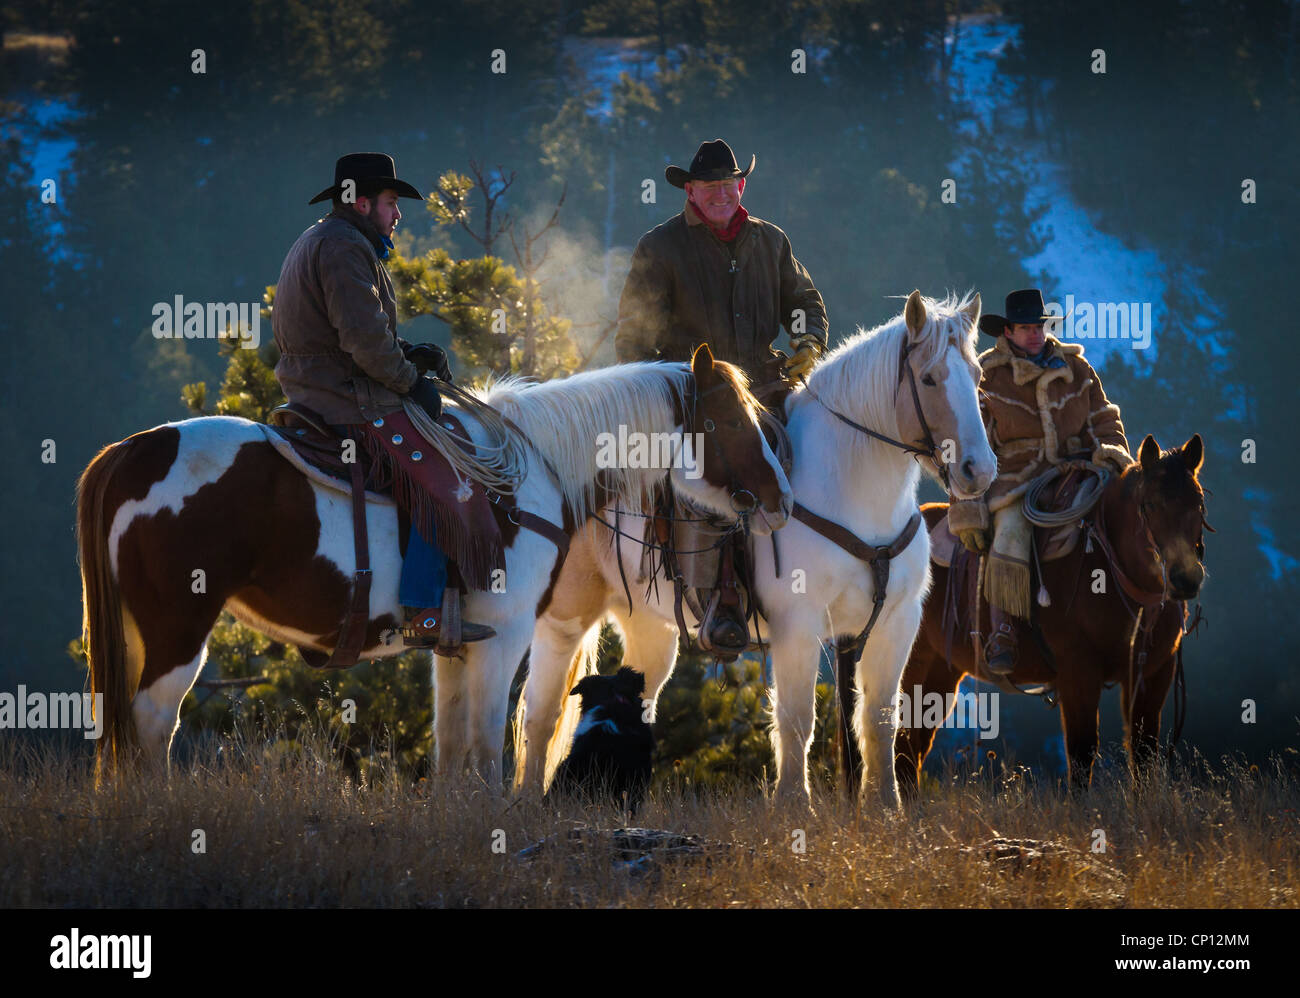 Cowboys on horseback in northeastern Wyoming Stock Photo